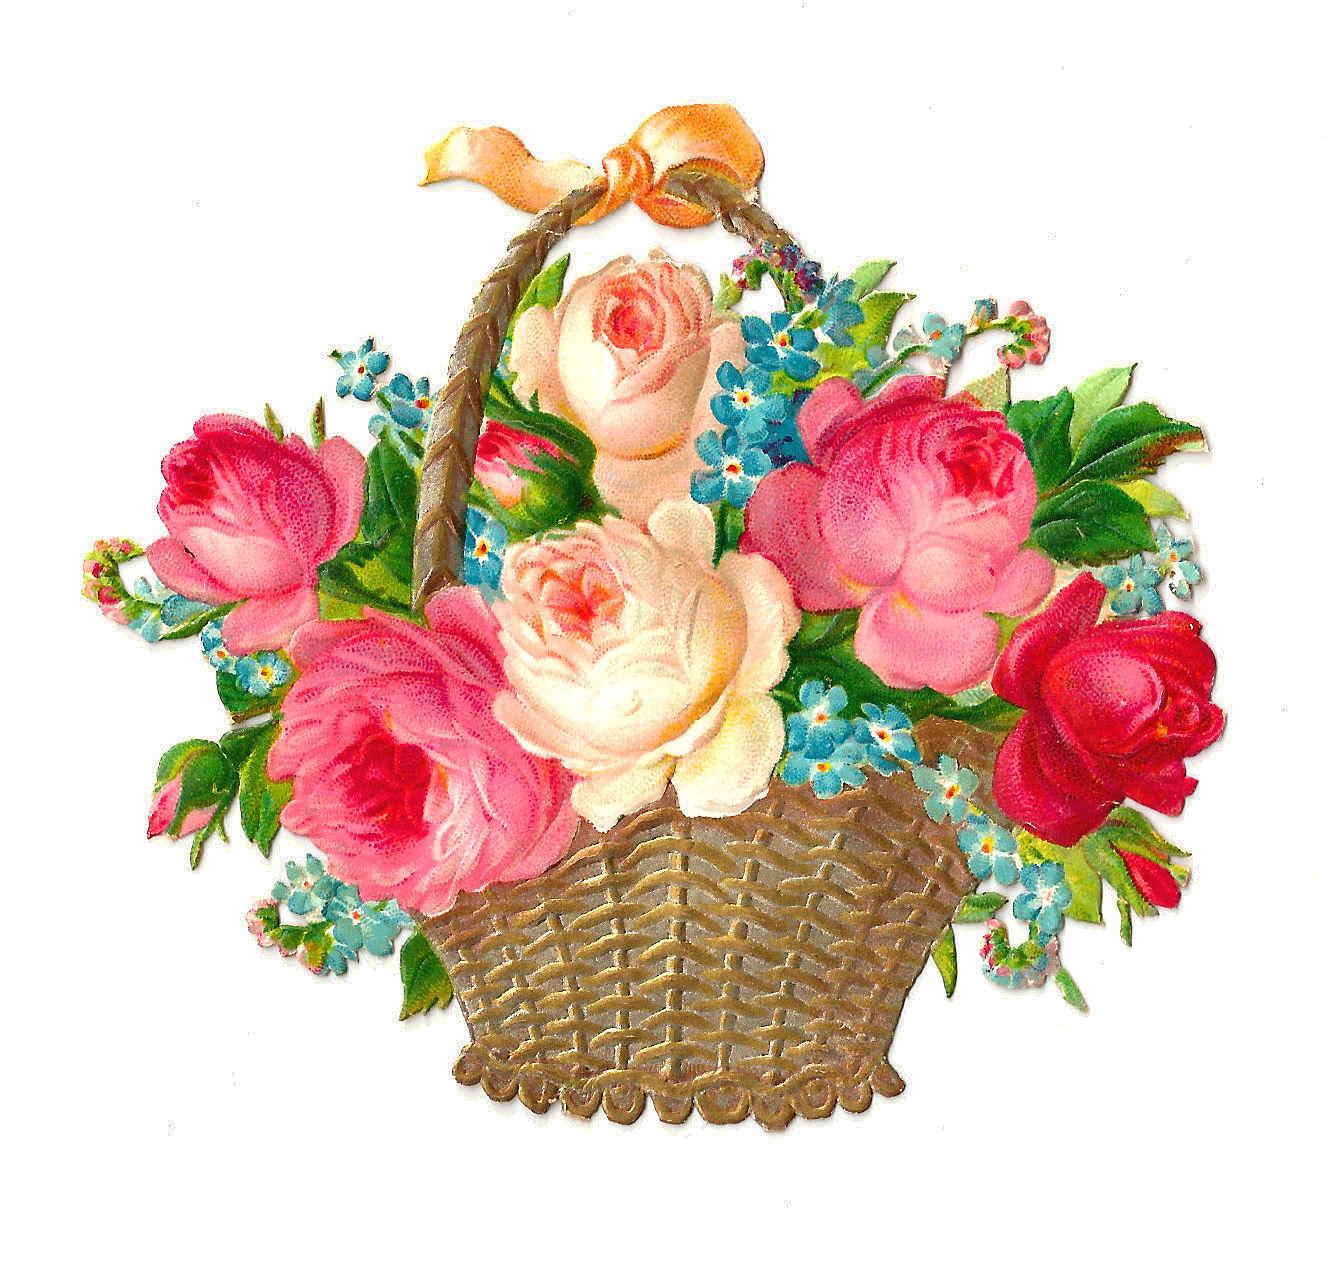 Gift Basket PNG HD - 125752